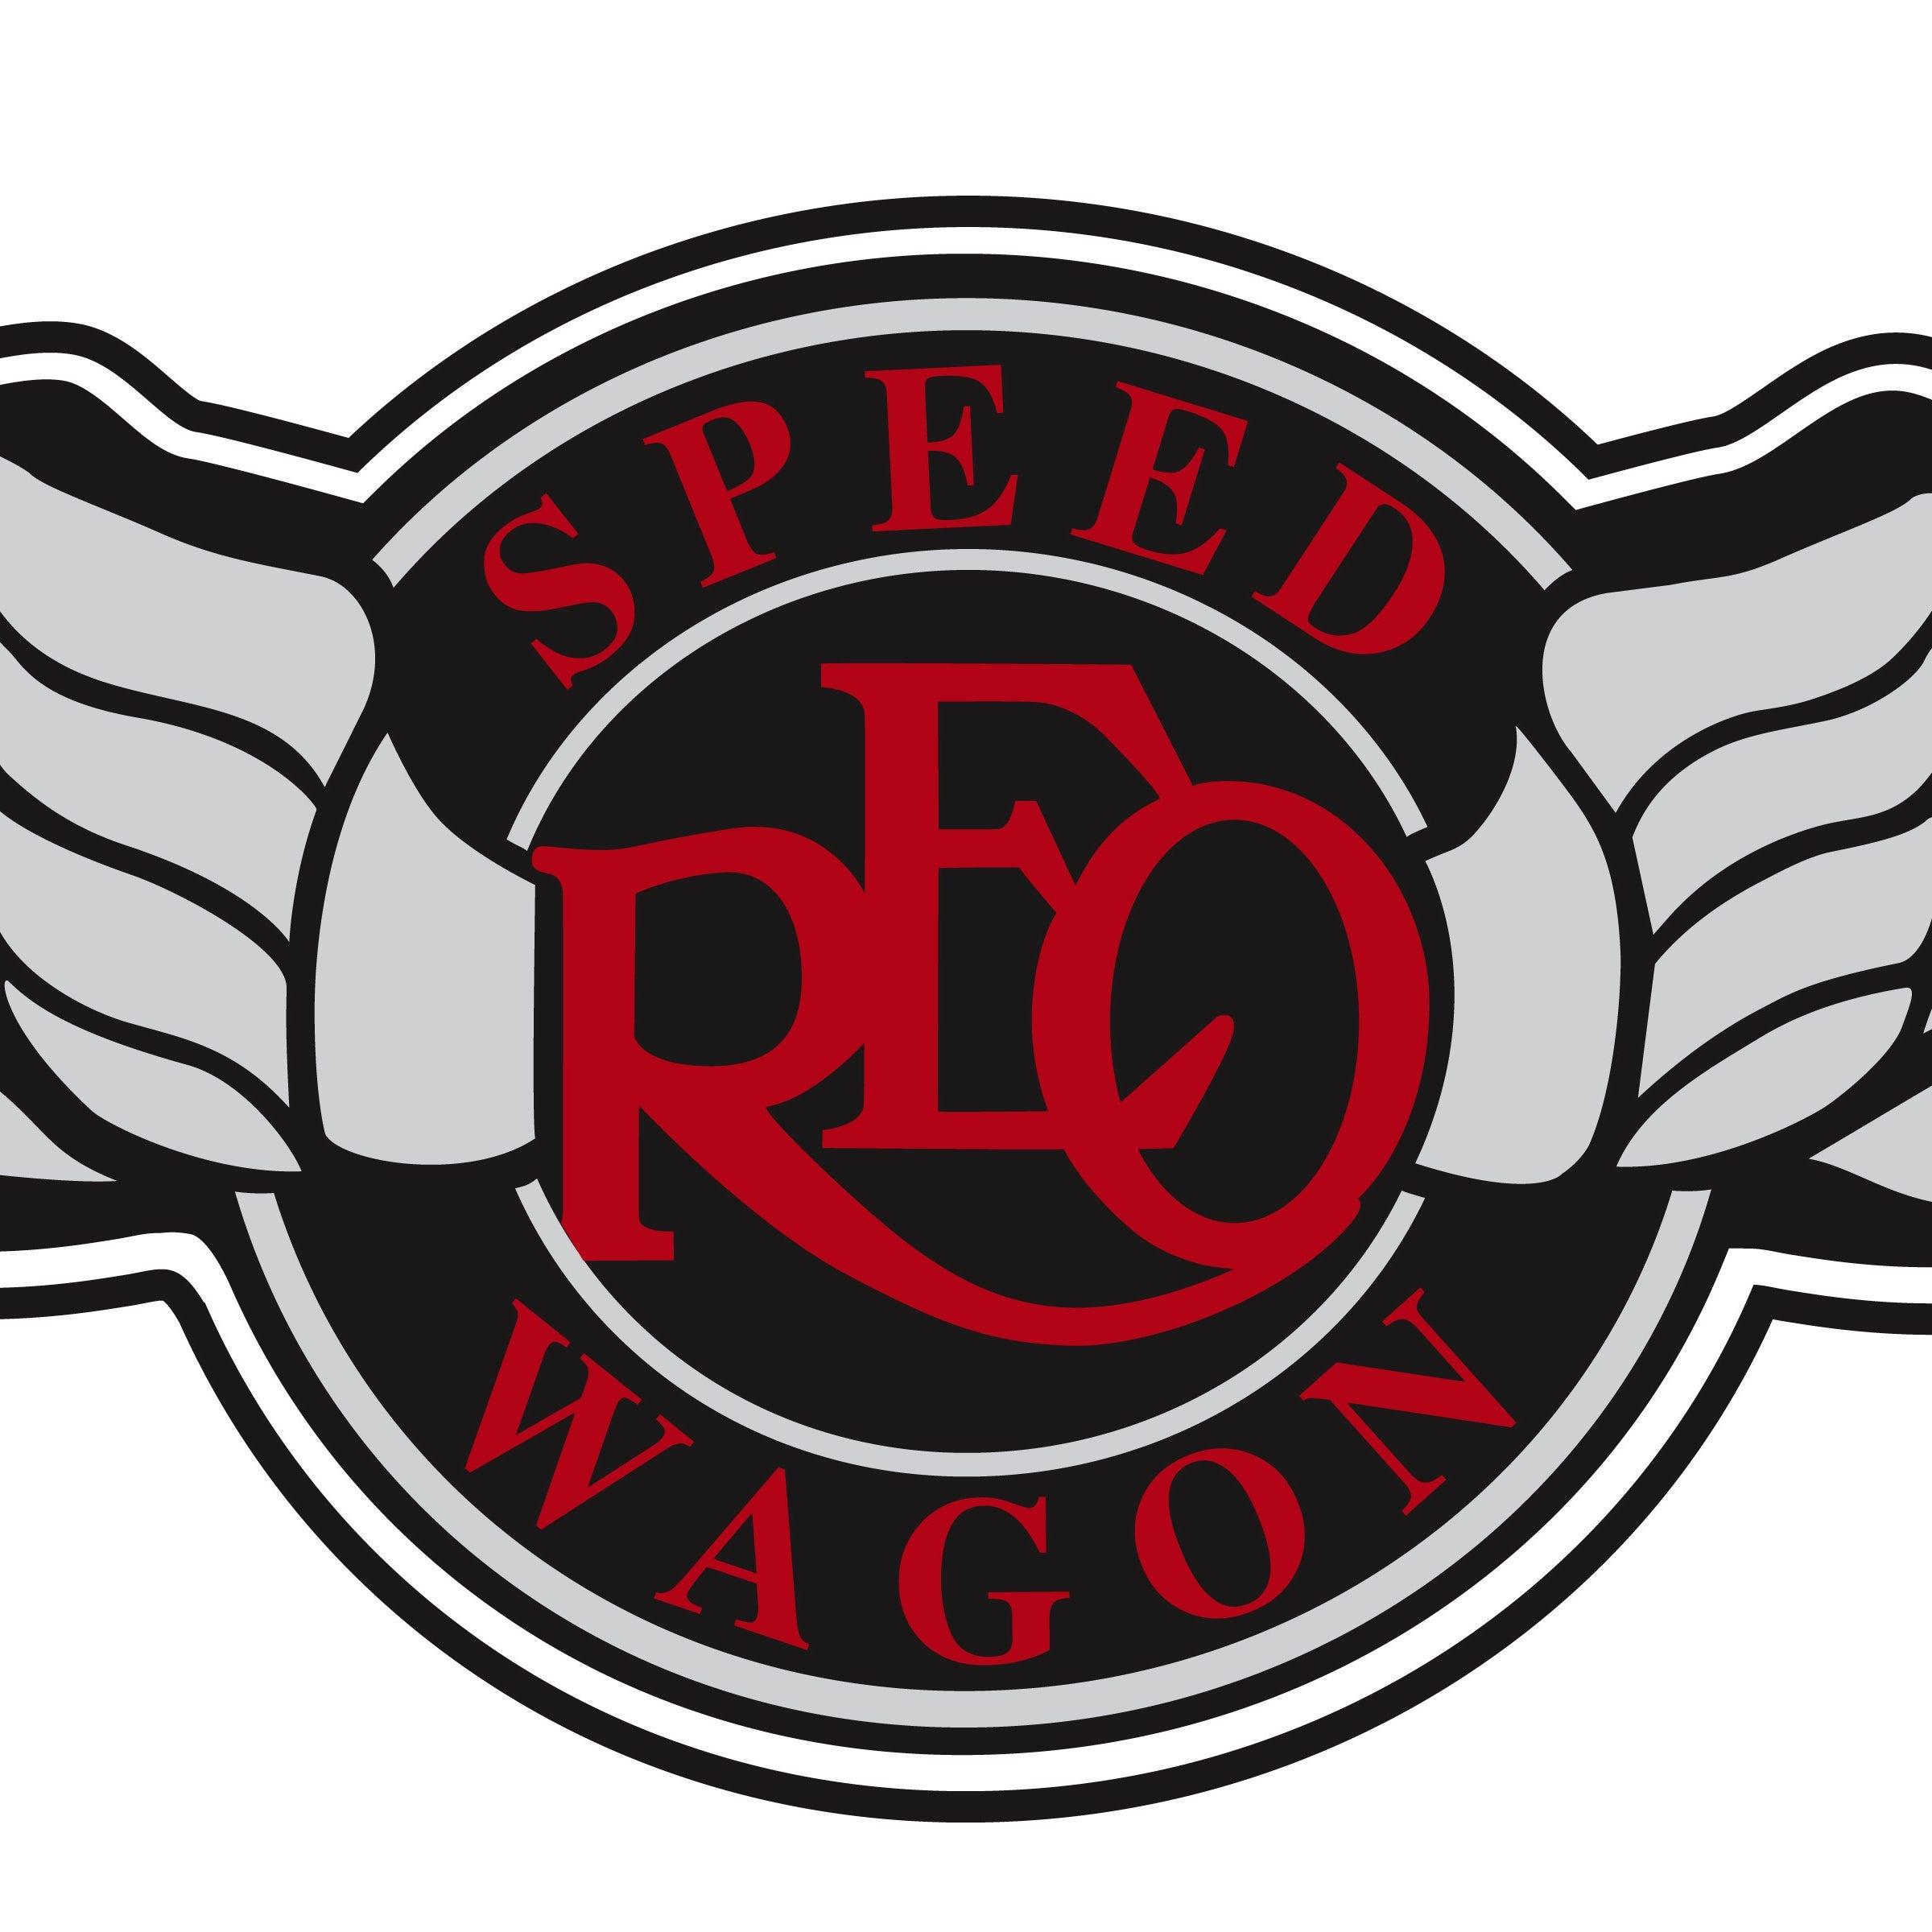 REO Blk Red Logo-2013.jpg